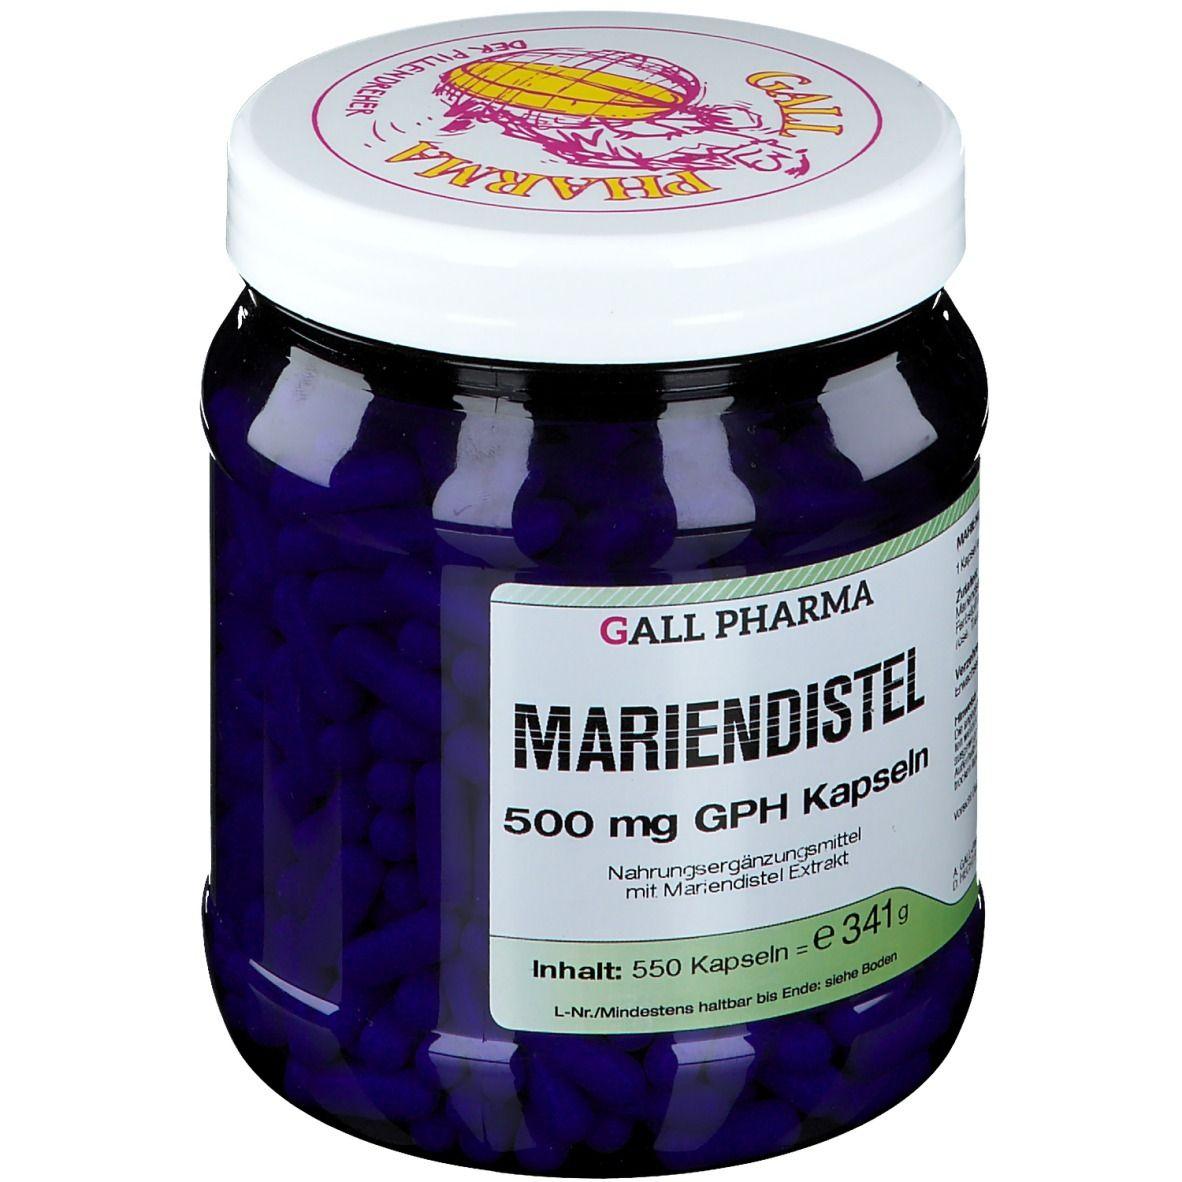 GALL PHARMA Mariendistel 500 mg GPH Kapseln